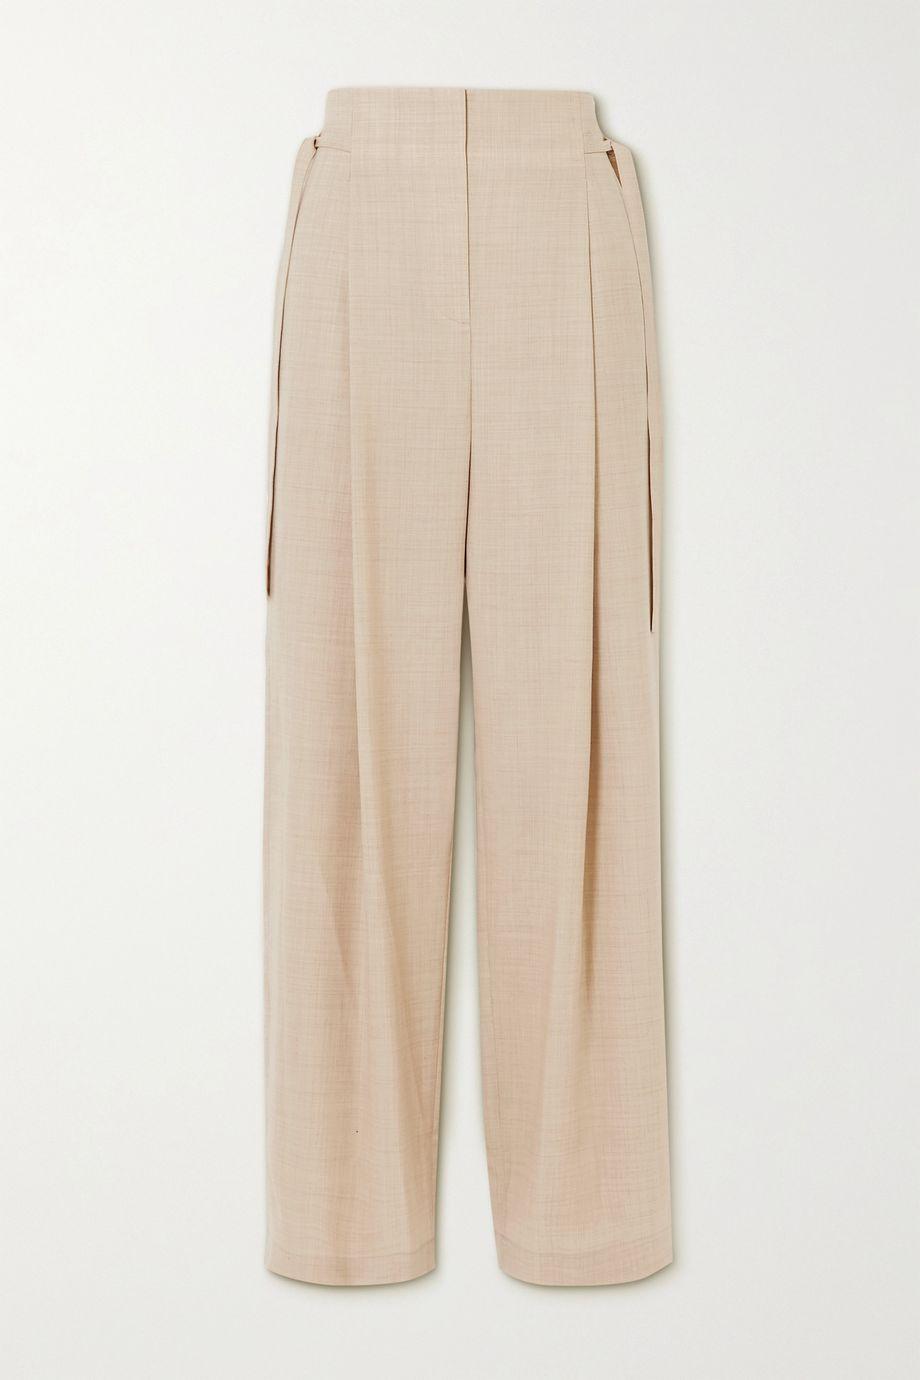 LE 17 SEPTEMBRE Tie-detailed wool straight-leg pants